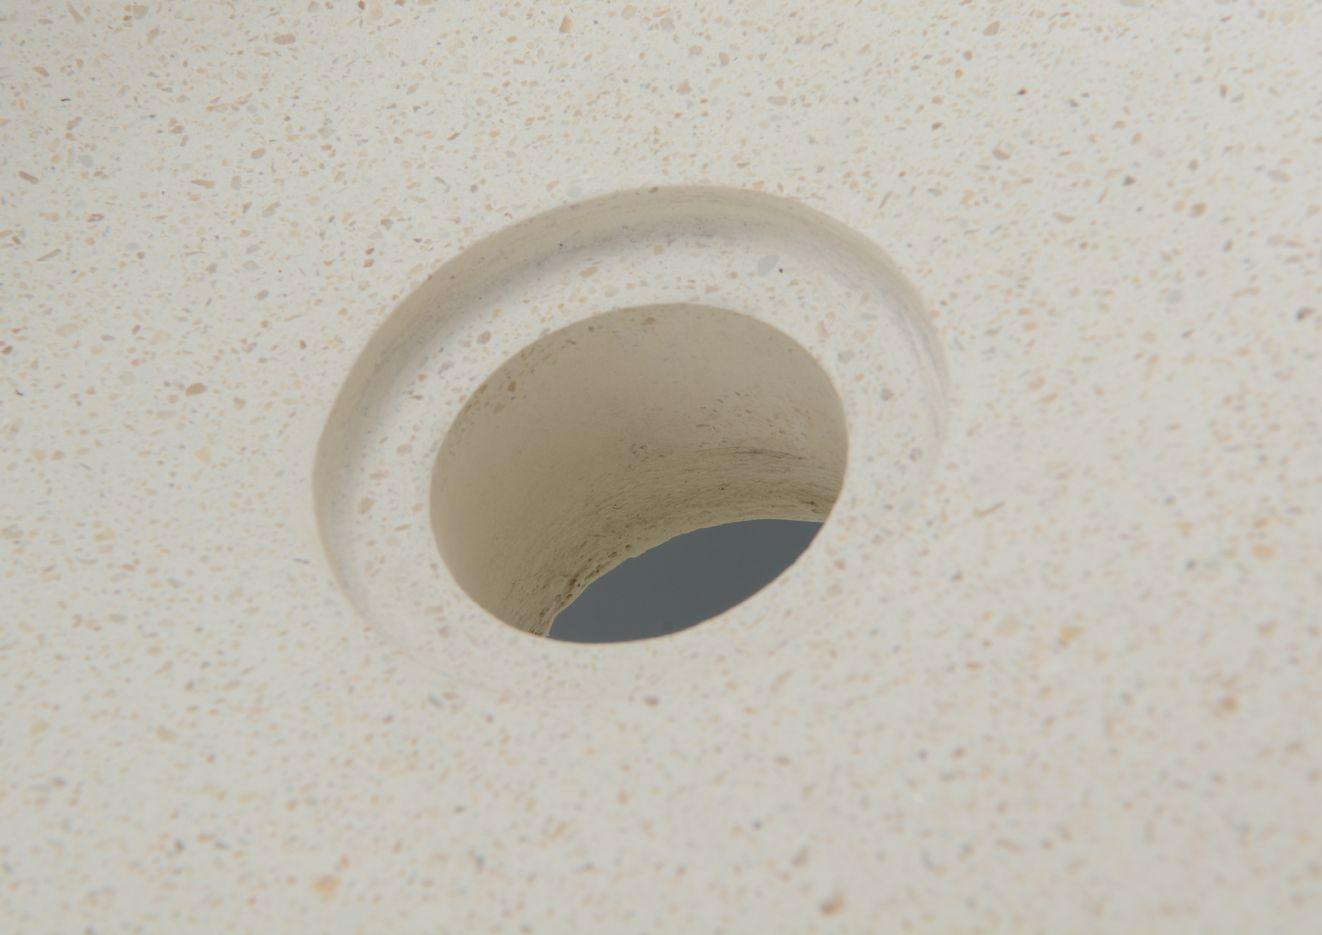 Meuble Tv Bas Pin : Meuble Vasque 2 Perle Meuble Vasque 2 Perle 0 0 5 Lire Avis 964 Dont